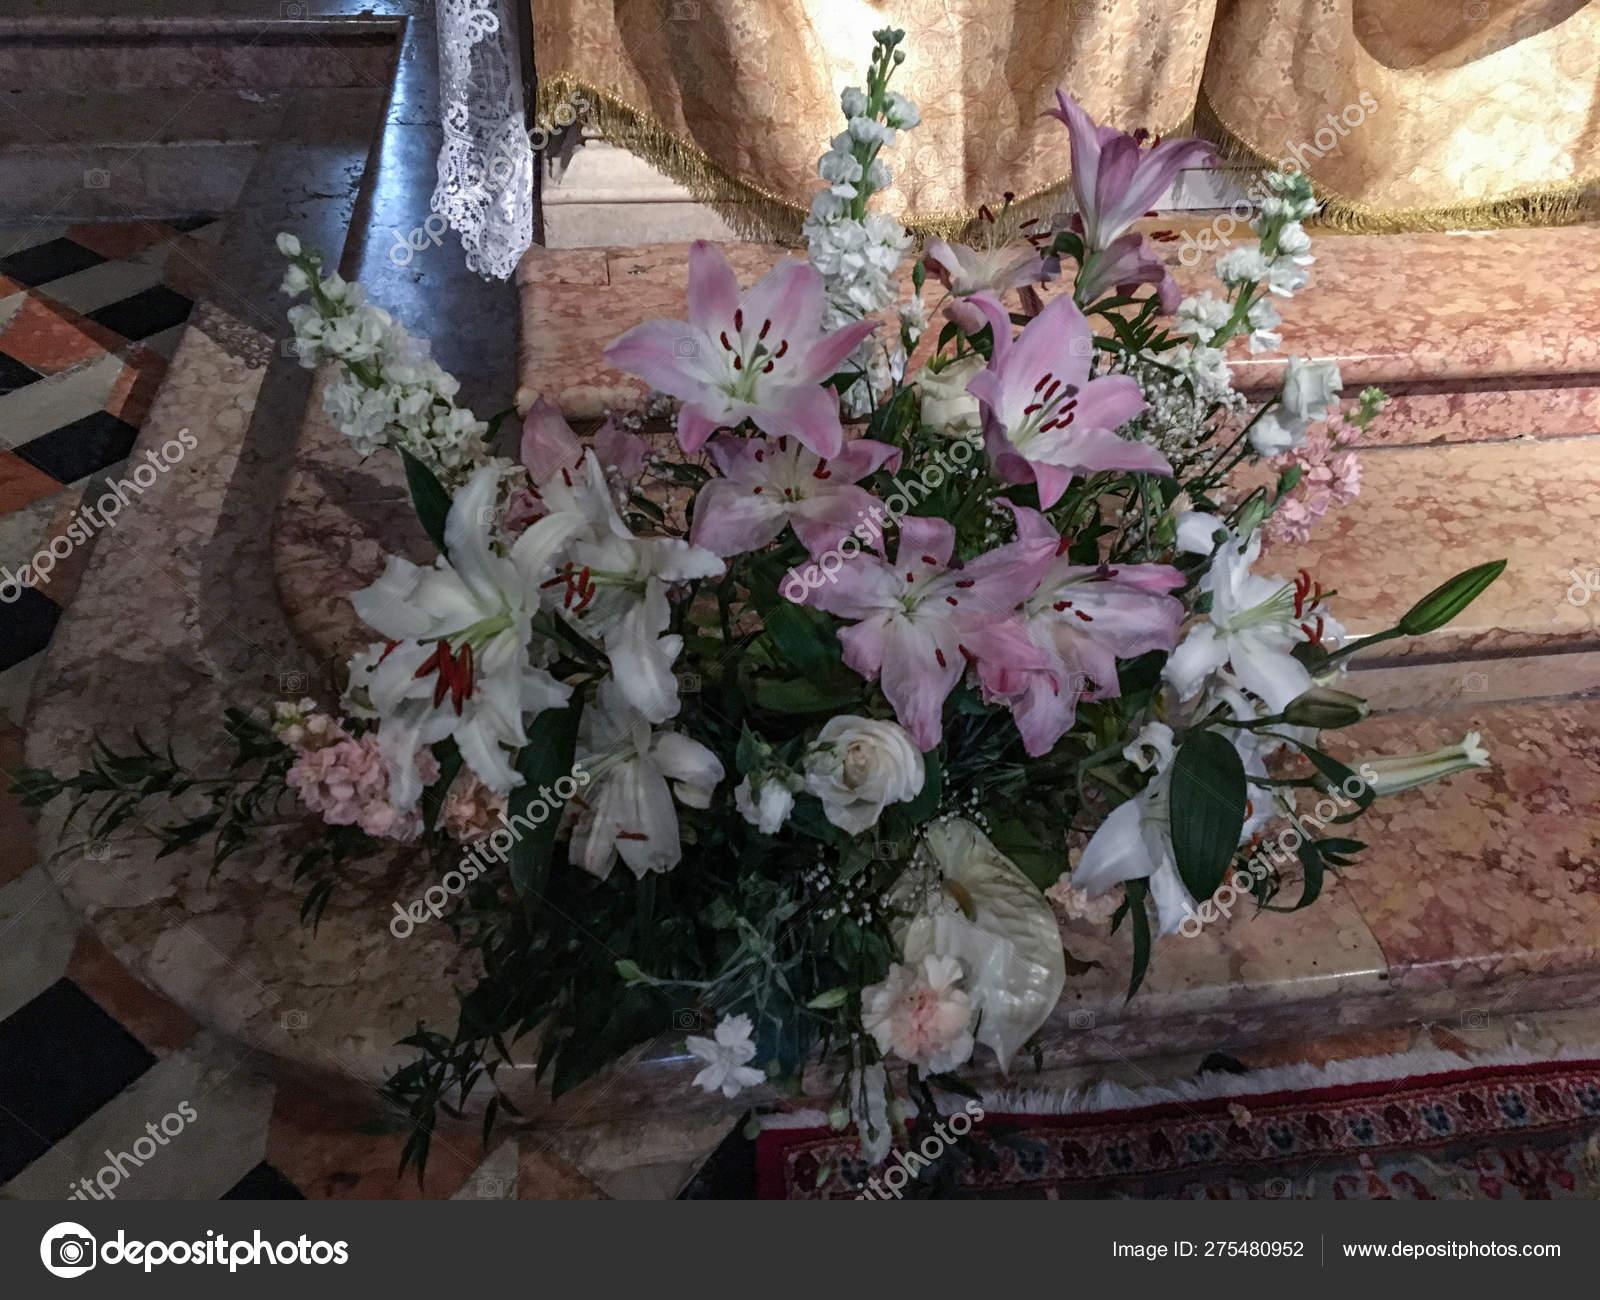 Flower Arrangement Church Lily Rose Bridal Flowers Orchid Colorful Bouquet Stock Photo C Roza Sean 275480952